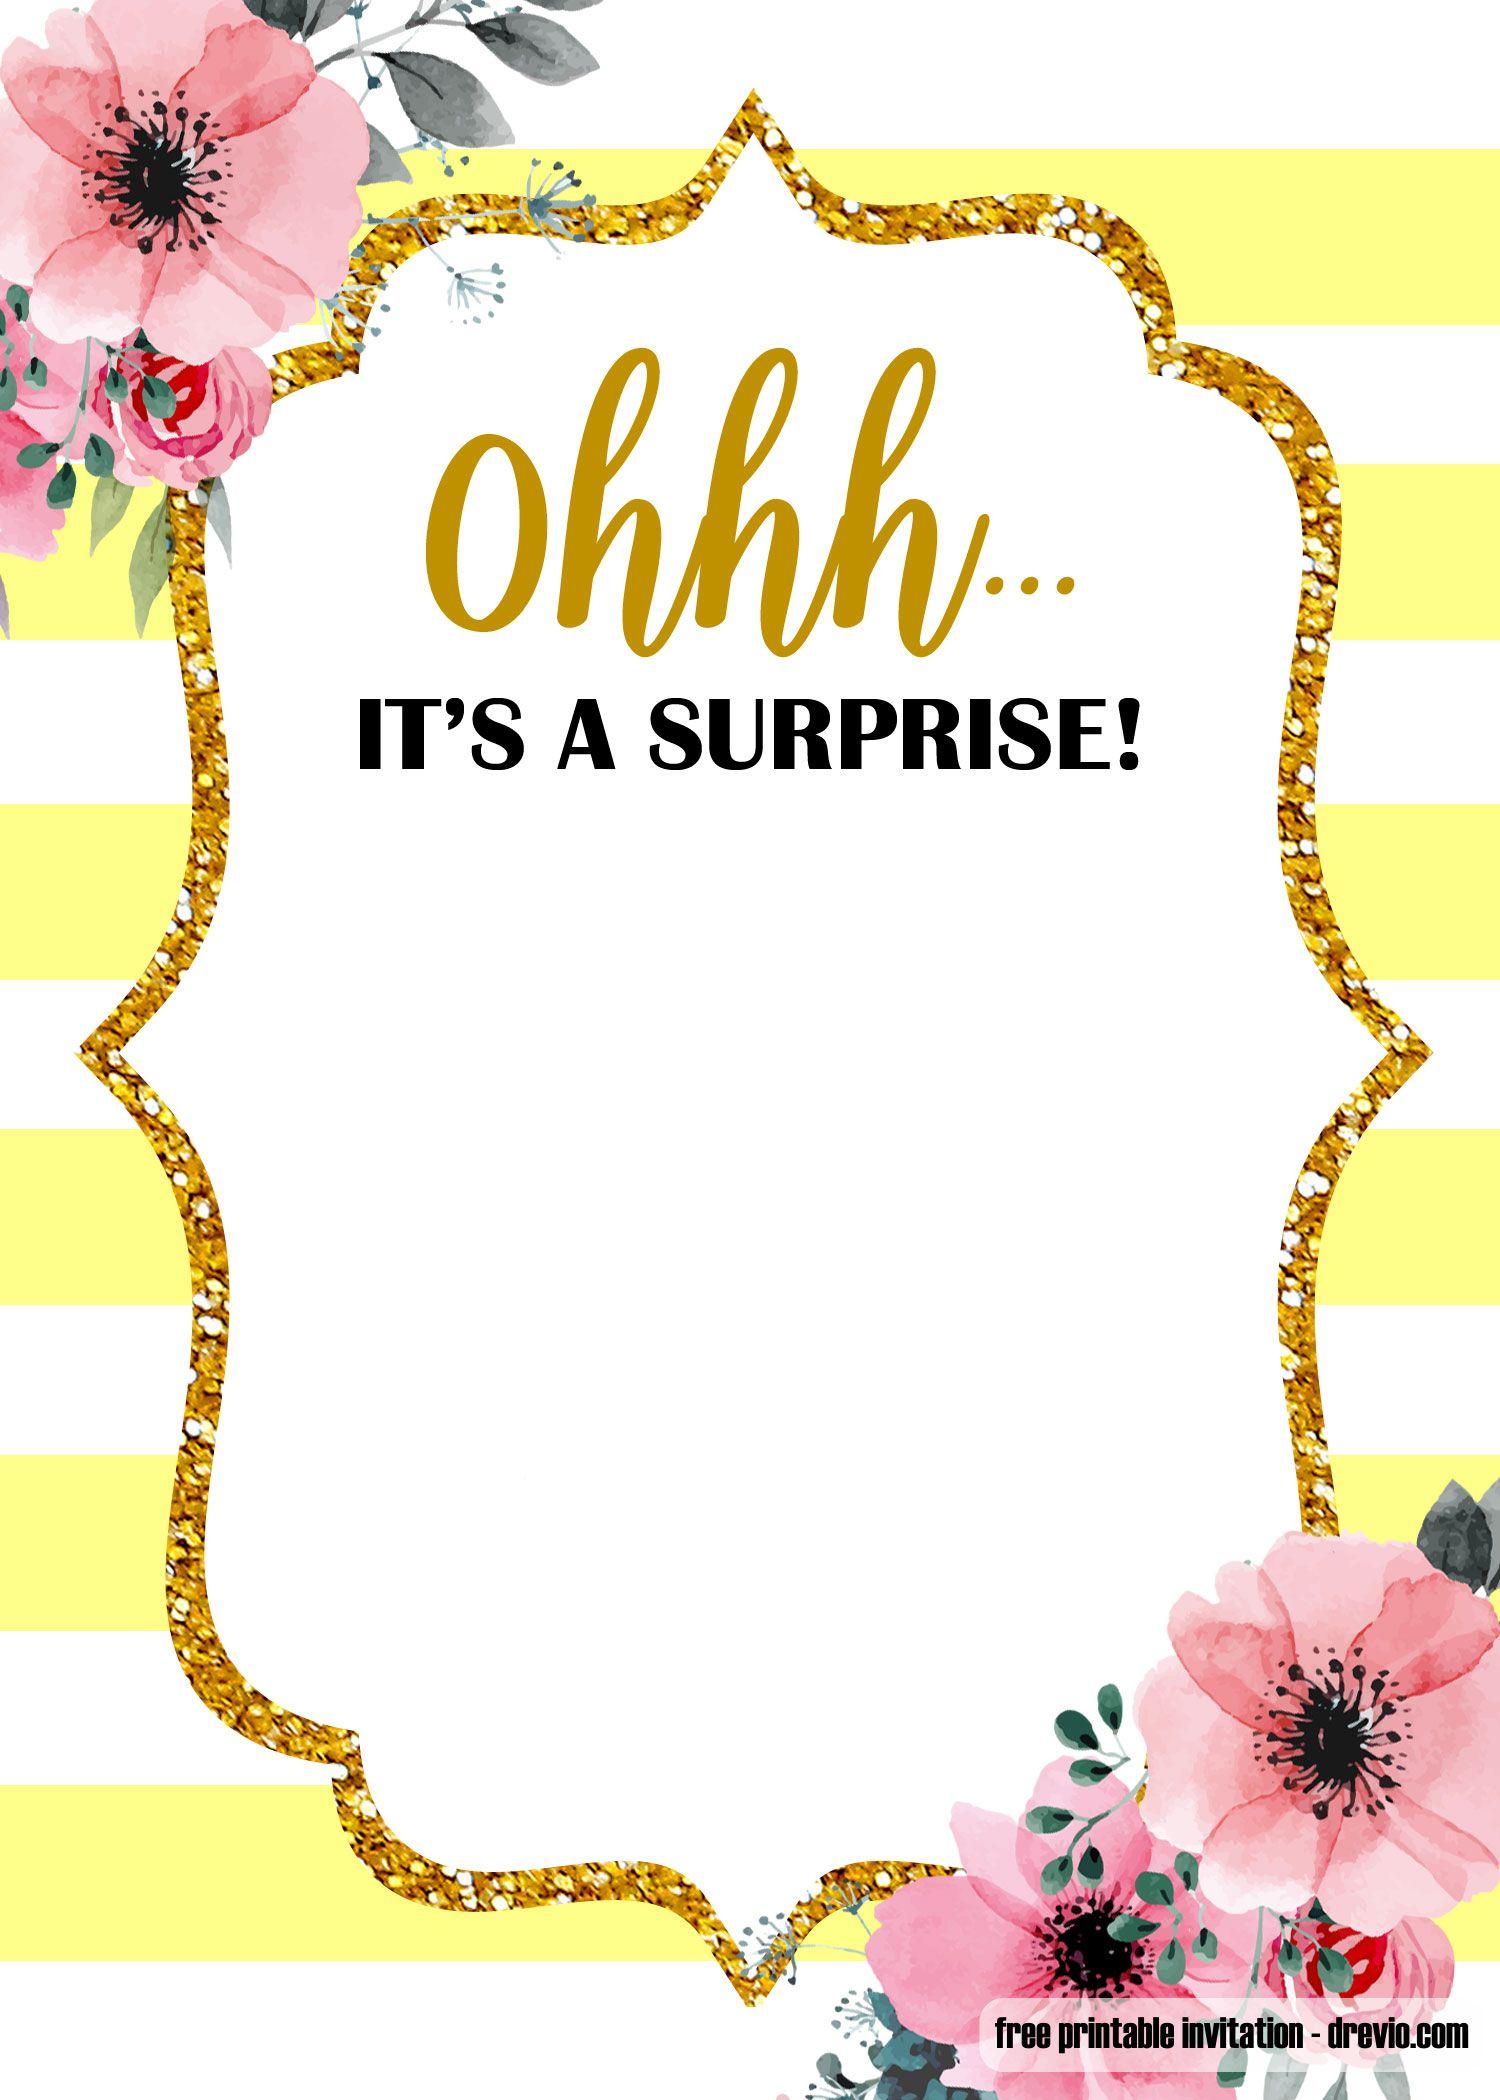 FREE Printable Surprise party Birthday Invitation Templates – FREE